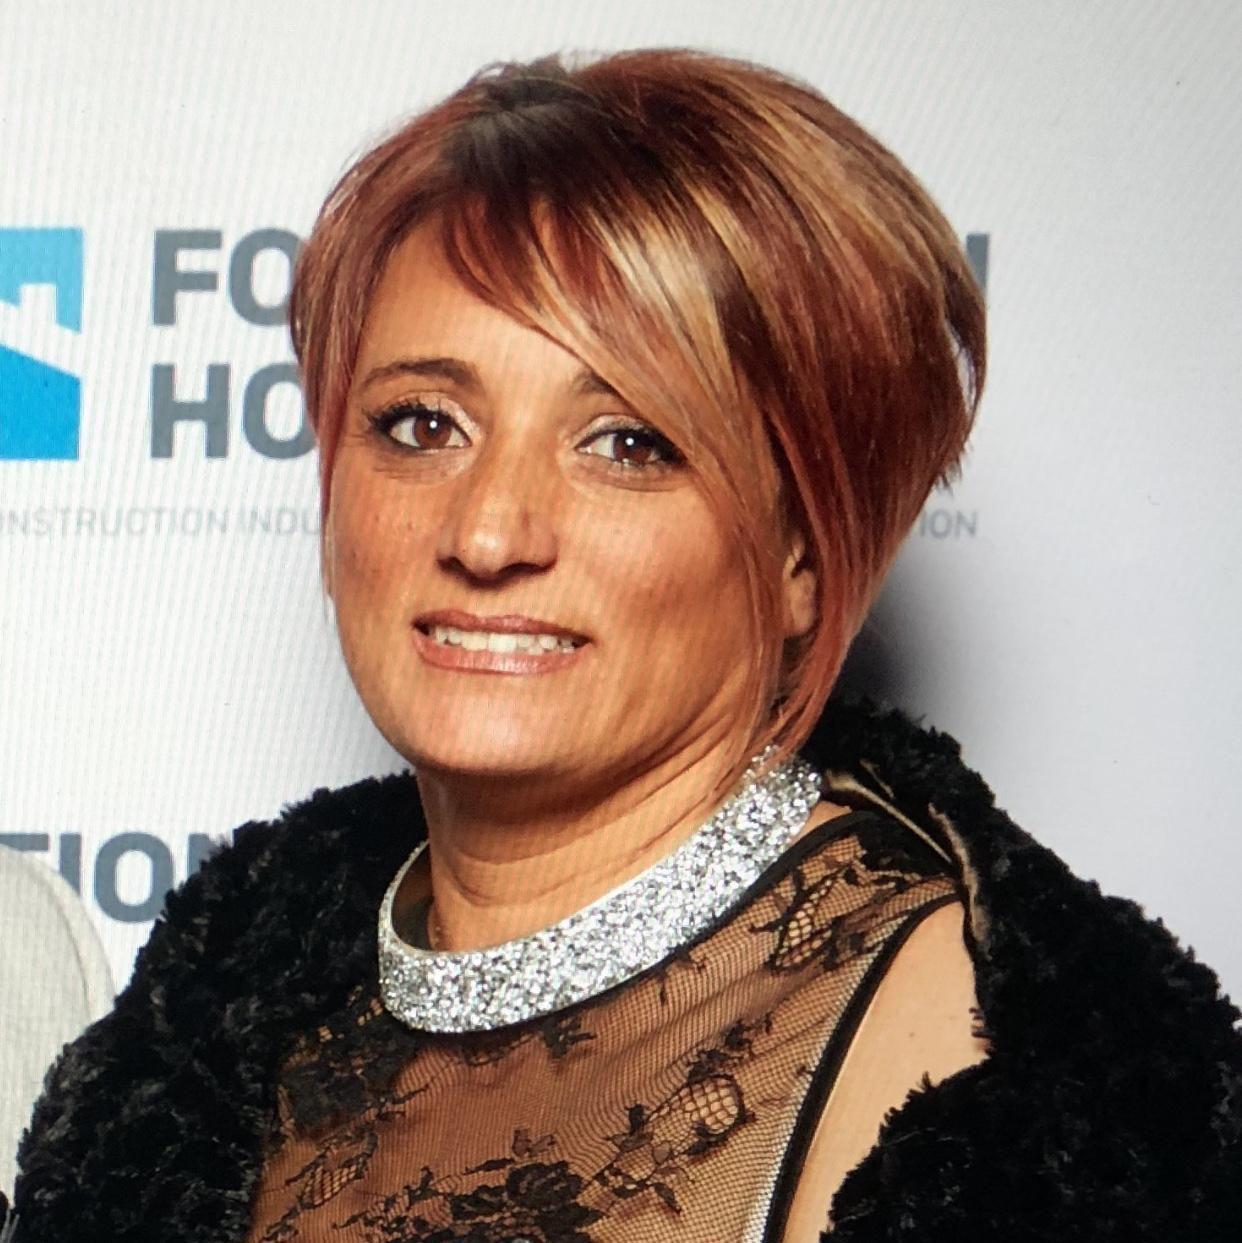 Patrizia Cassaniti